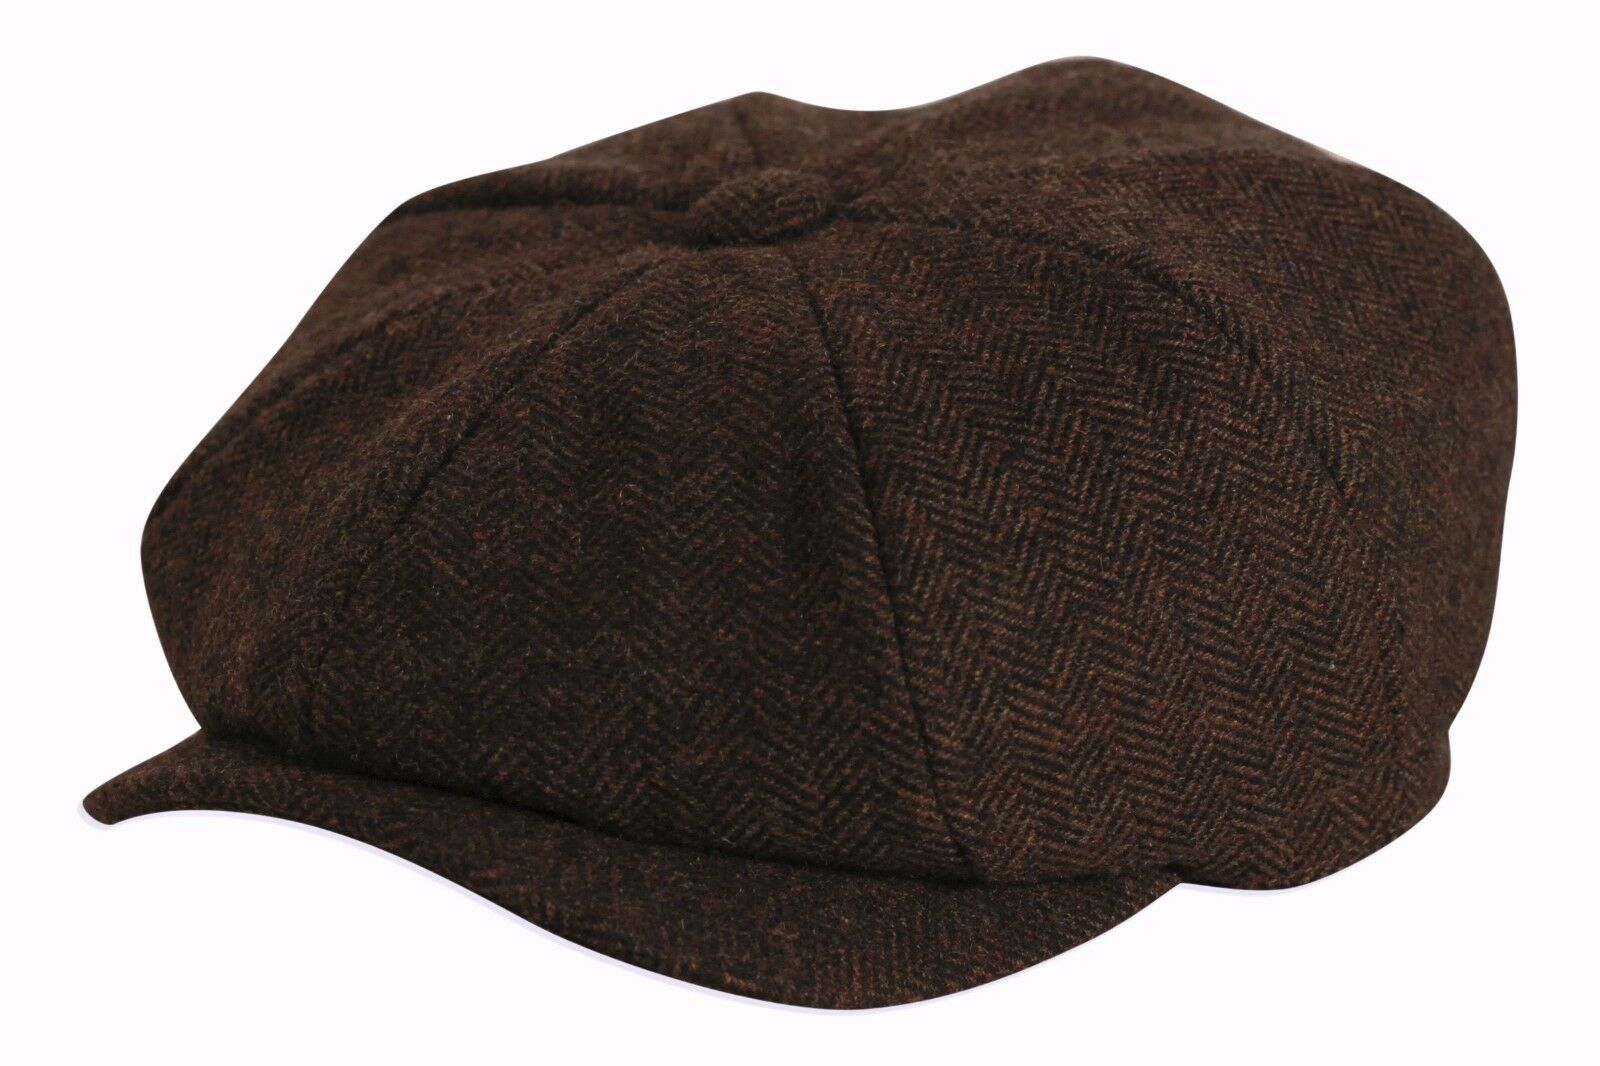 Gamble /& Gunn /'Shelby/' Nero Spina di Pesce pulsante Top Cap 59cm